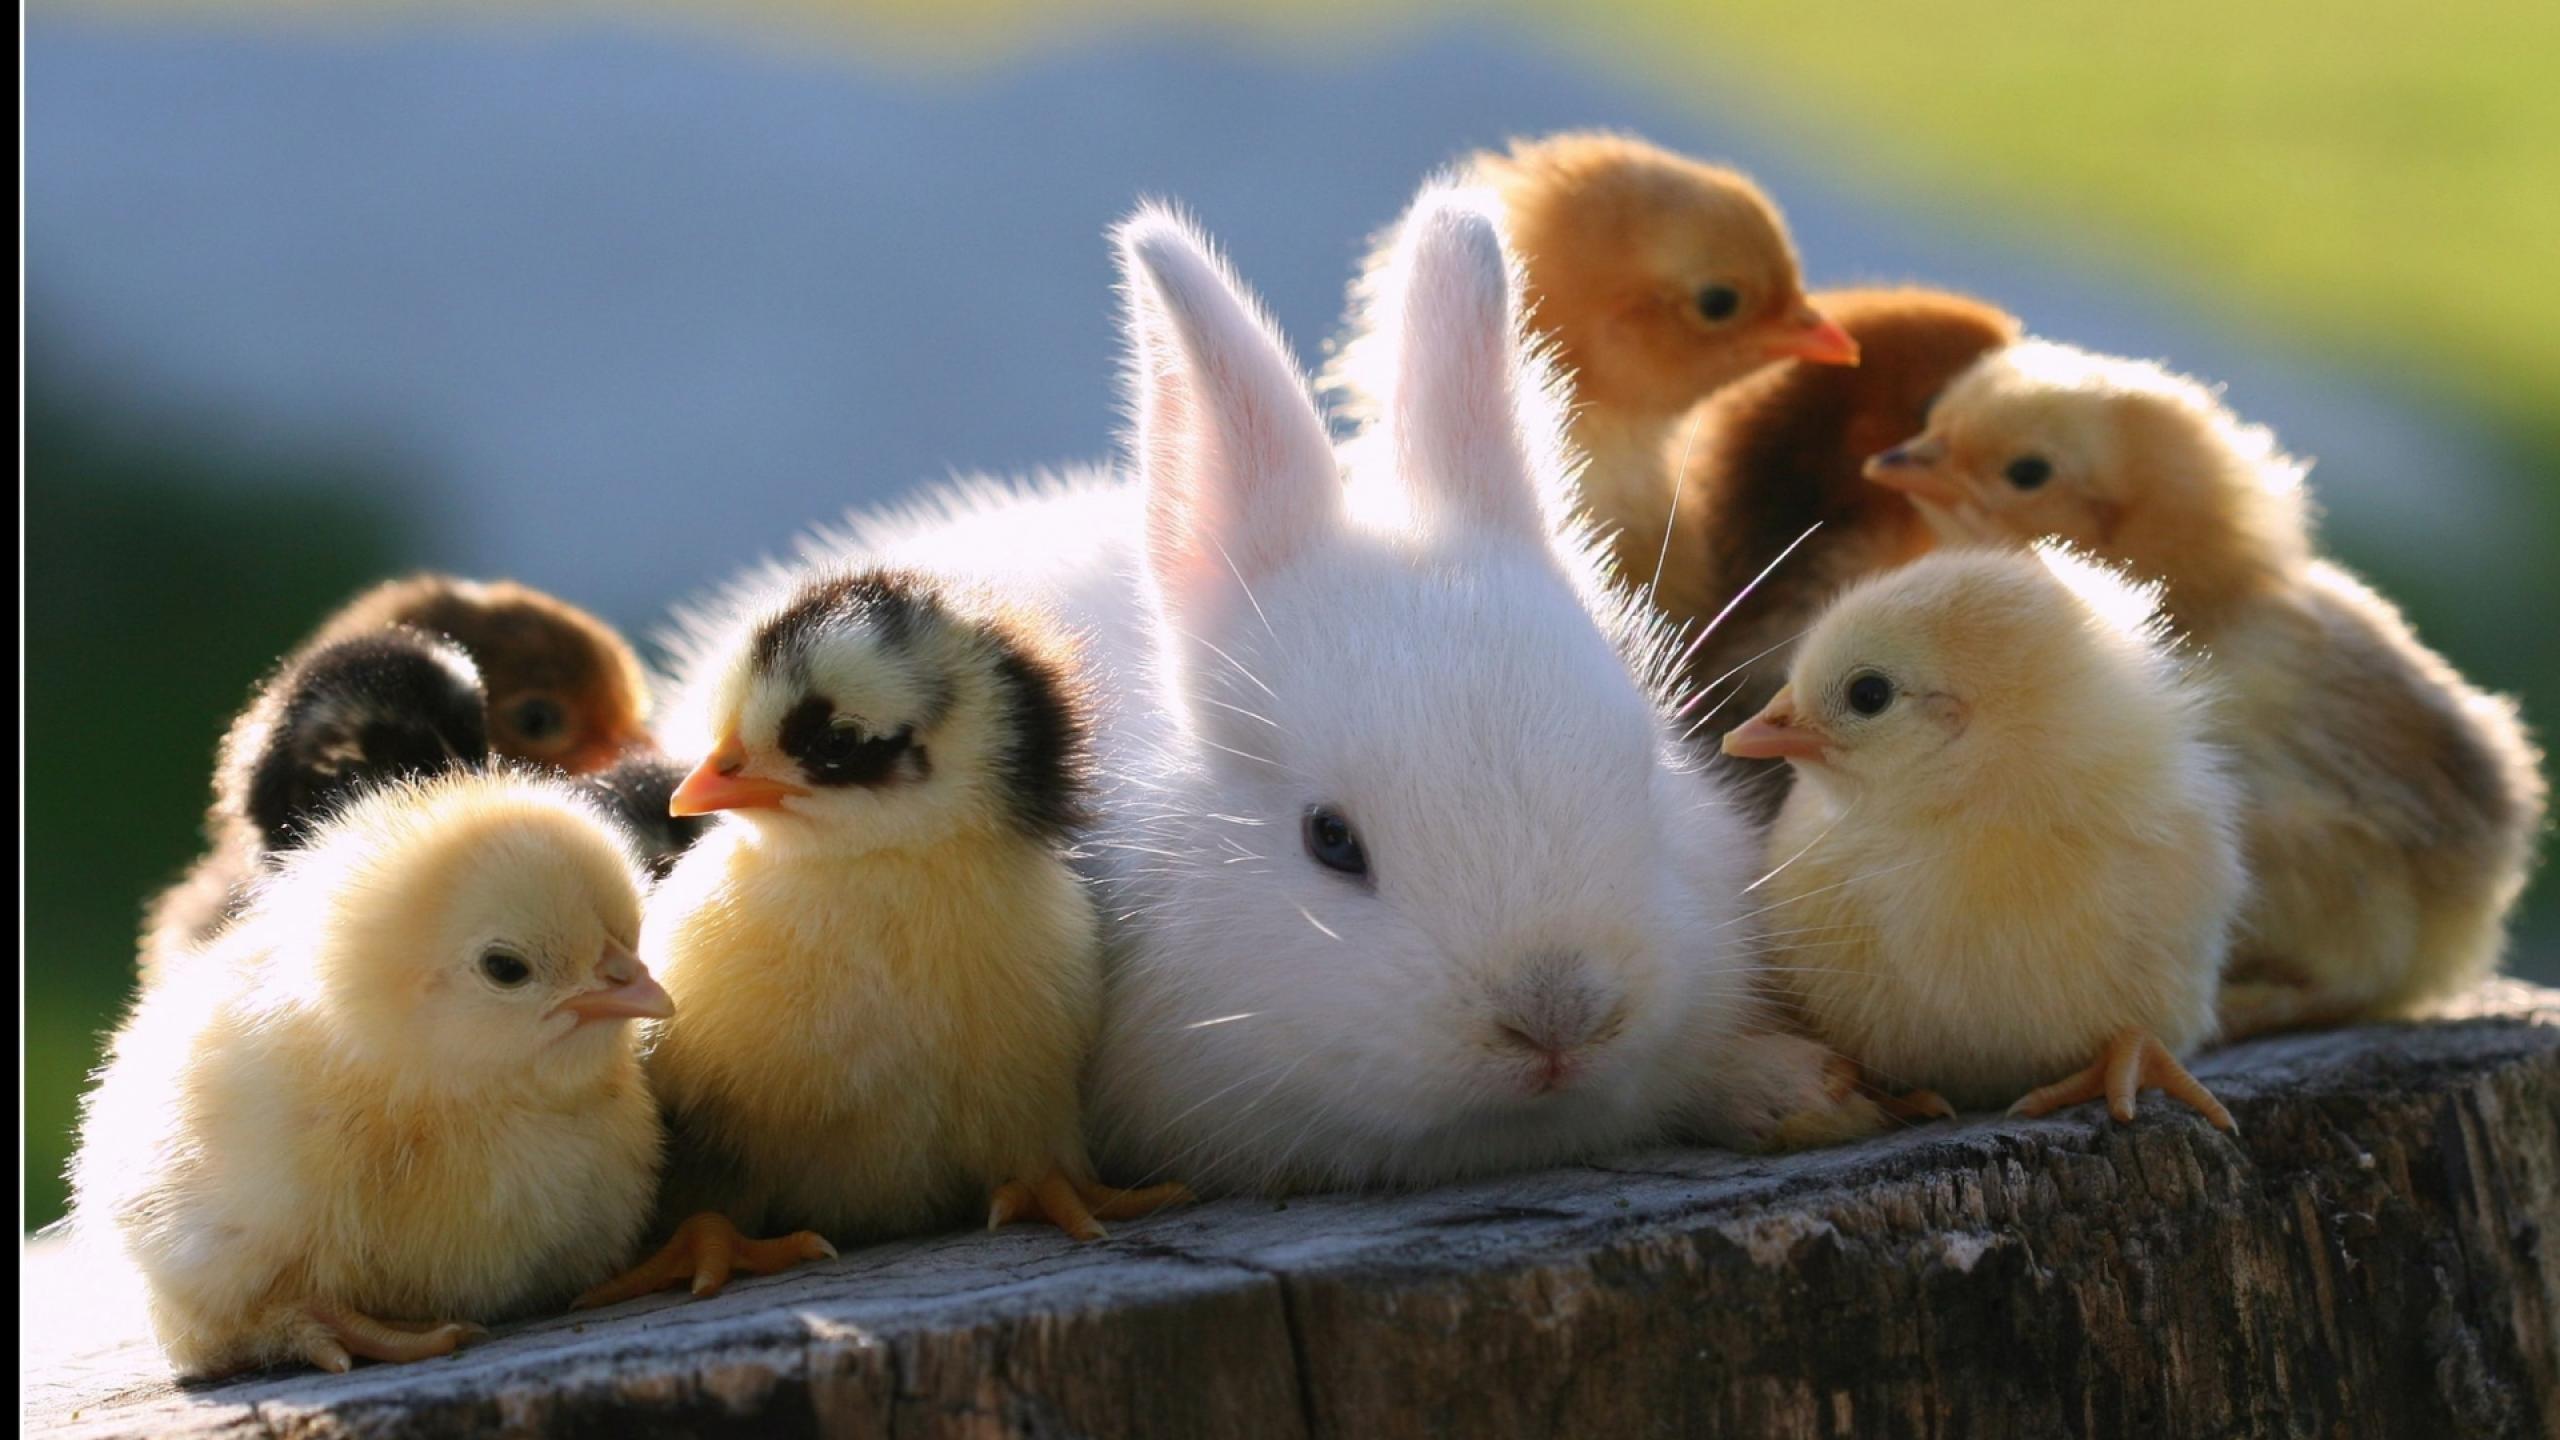 Cute baby animal wallpaper   1219074 2560x1440